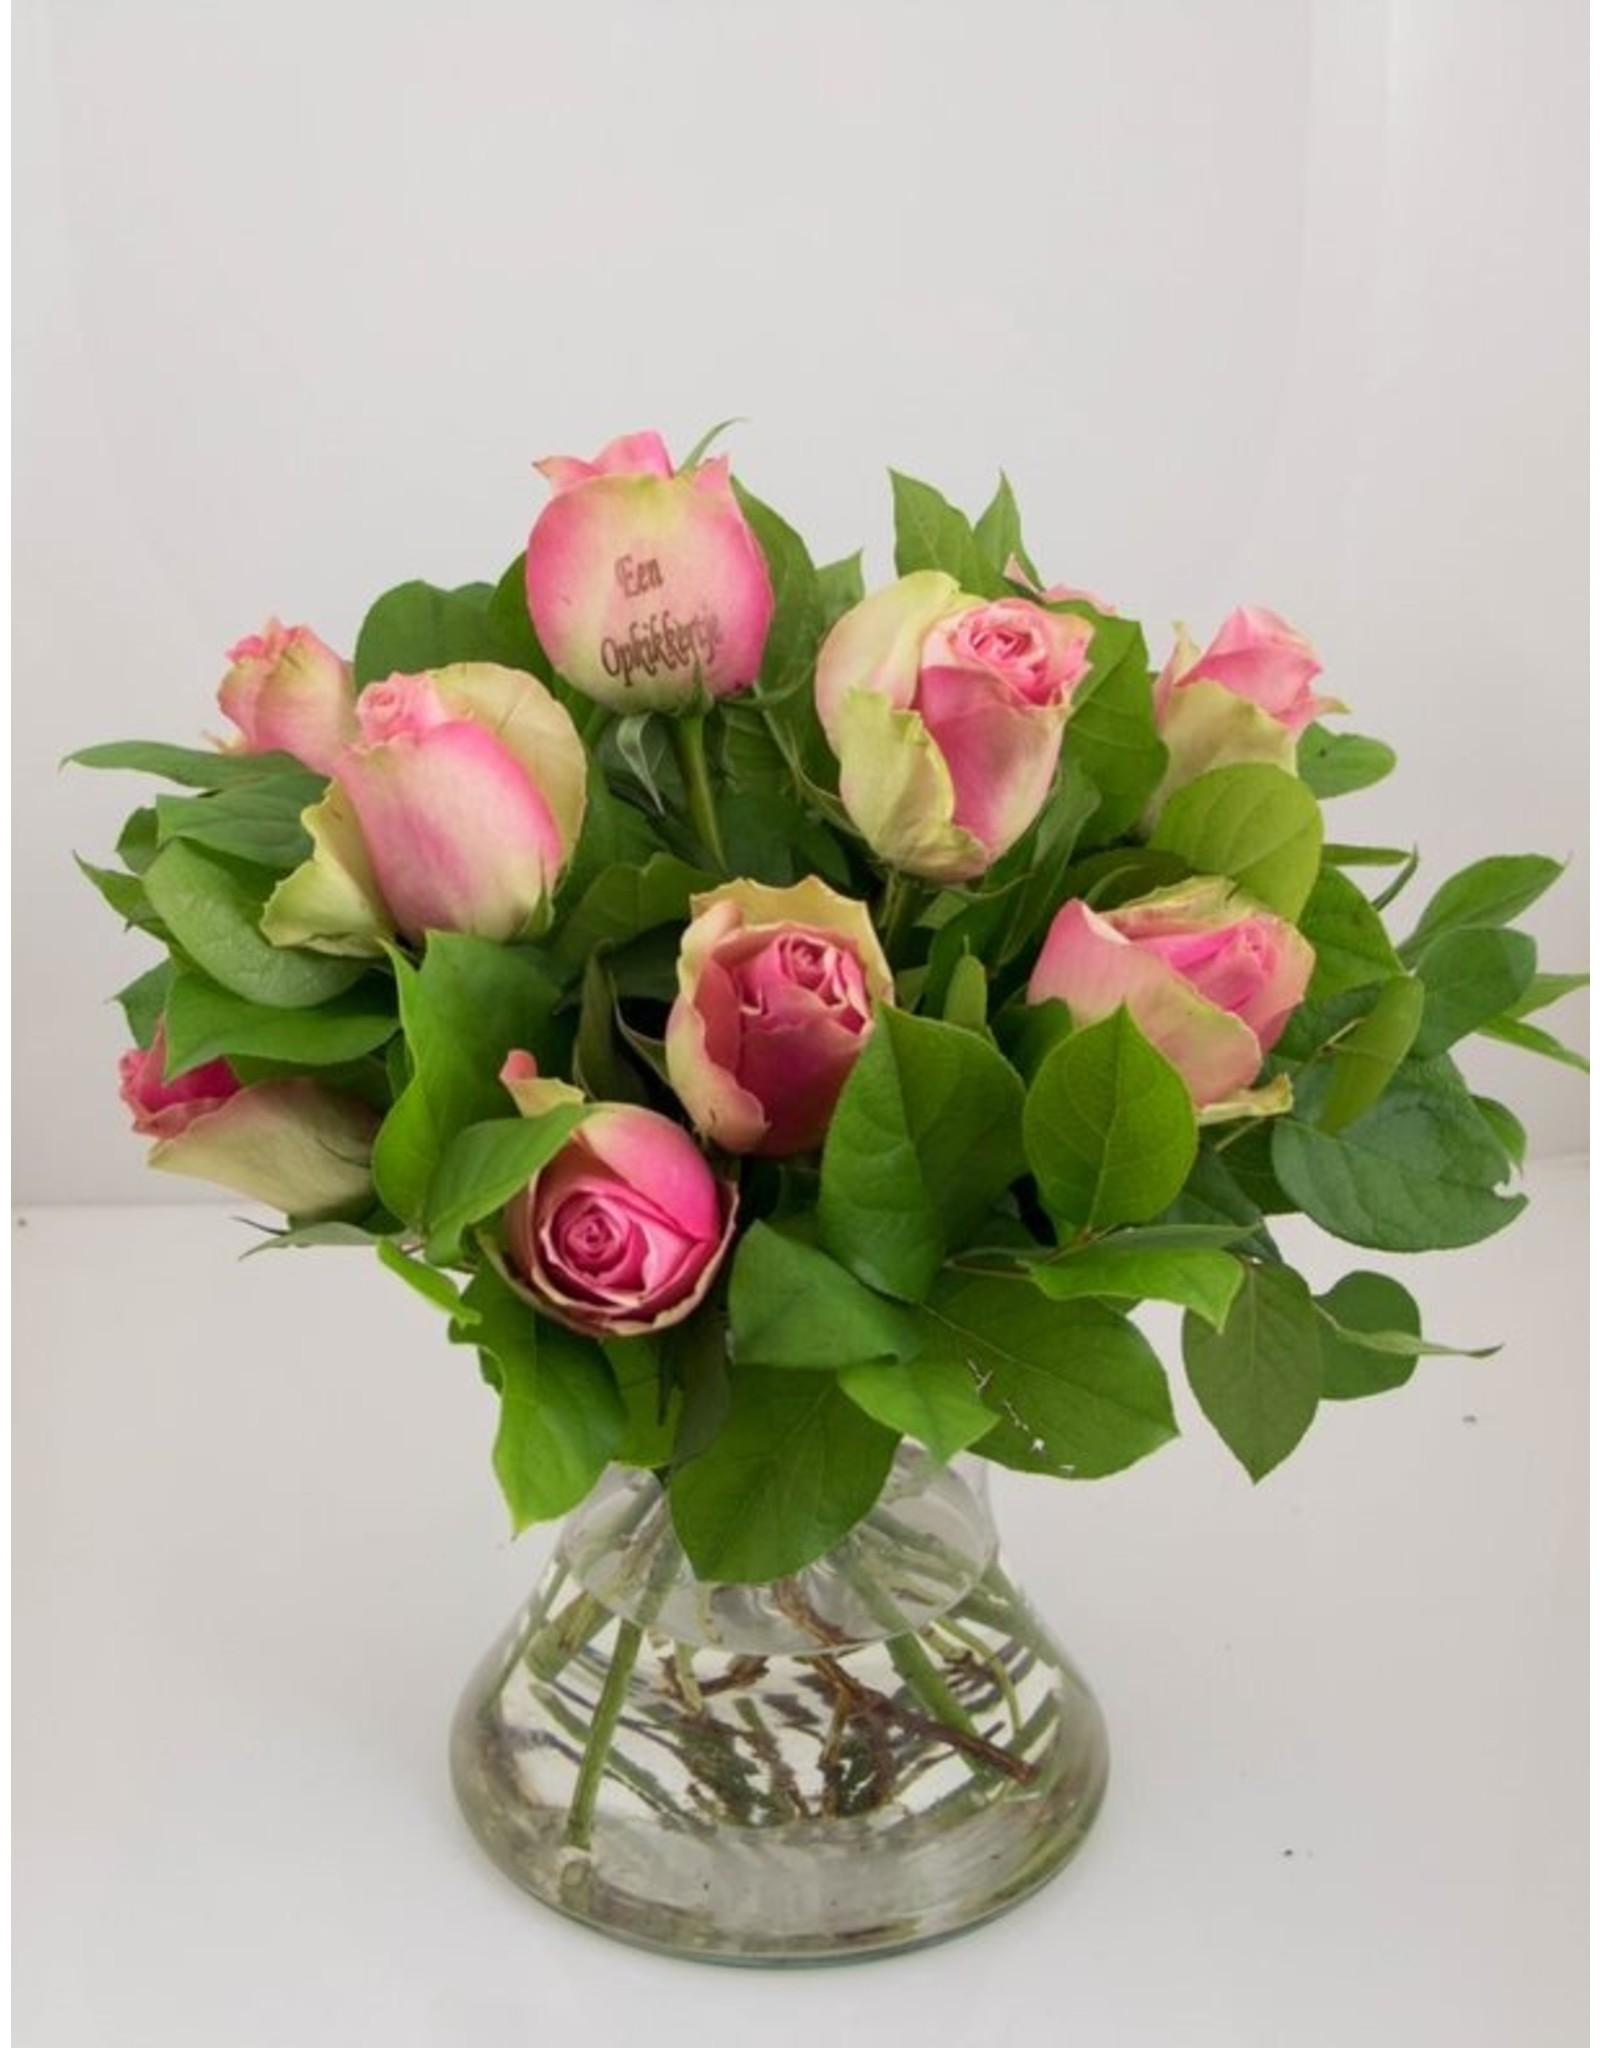 Magic Flowers Boeket 9 rozen - Roze - Een opkikkertje